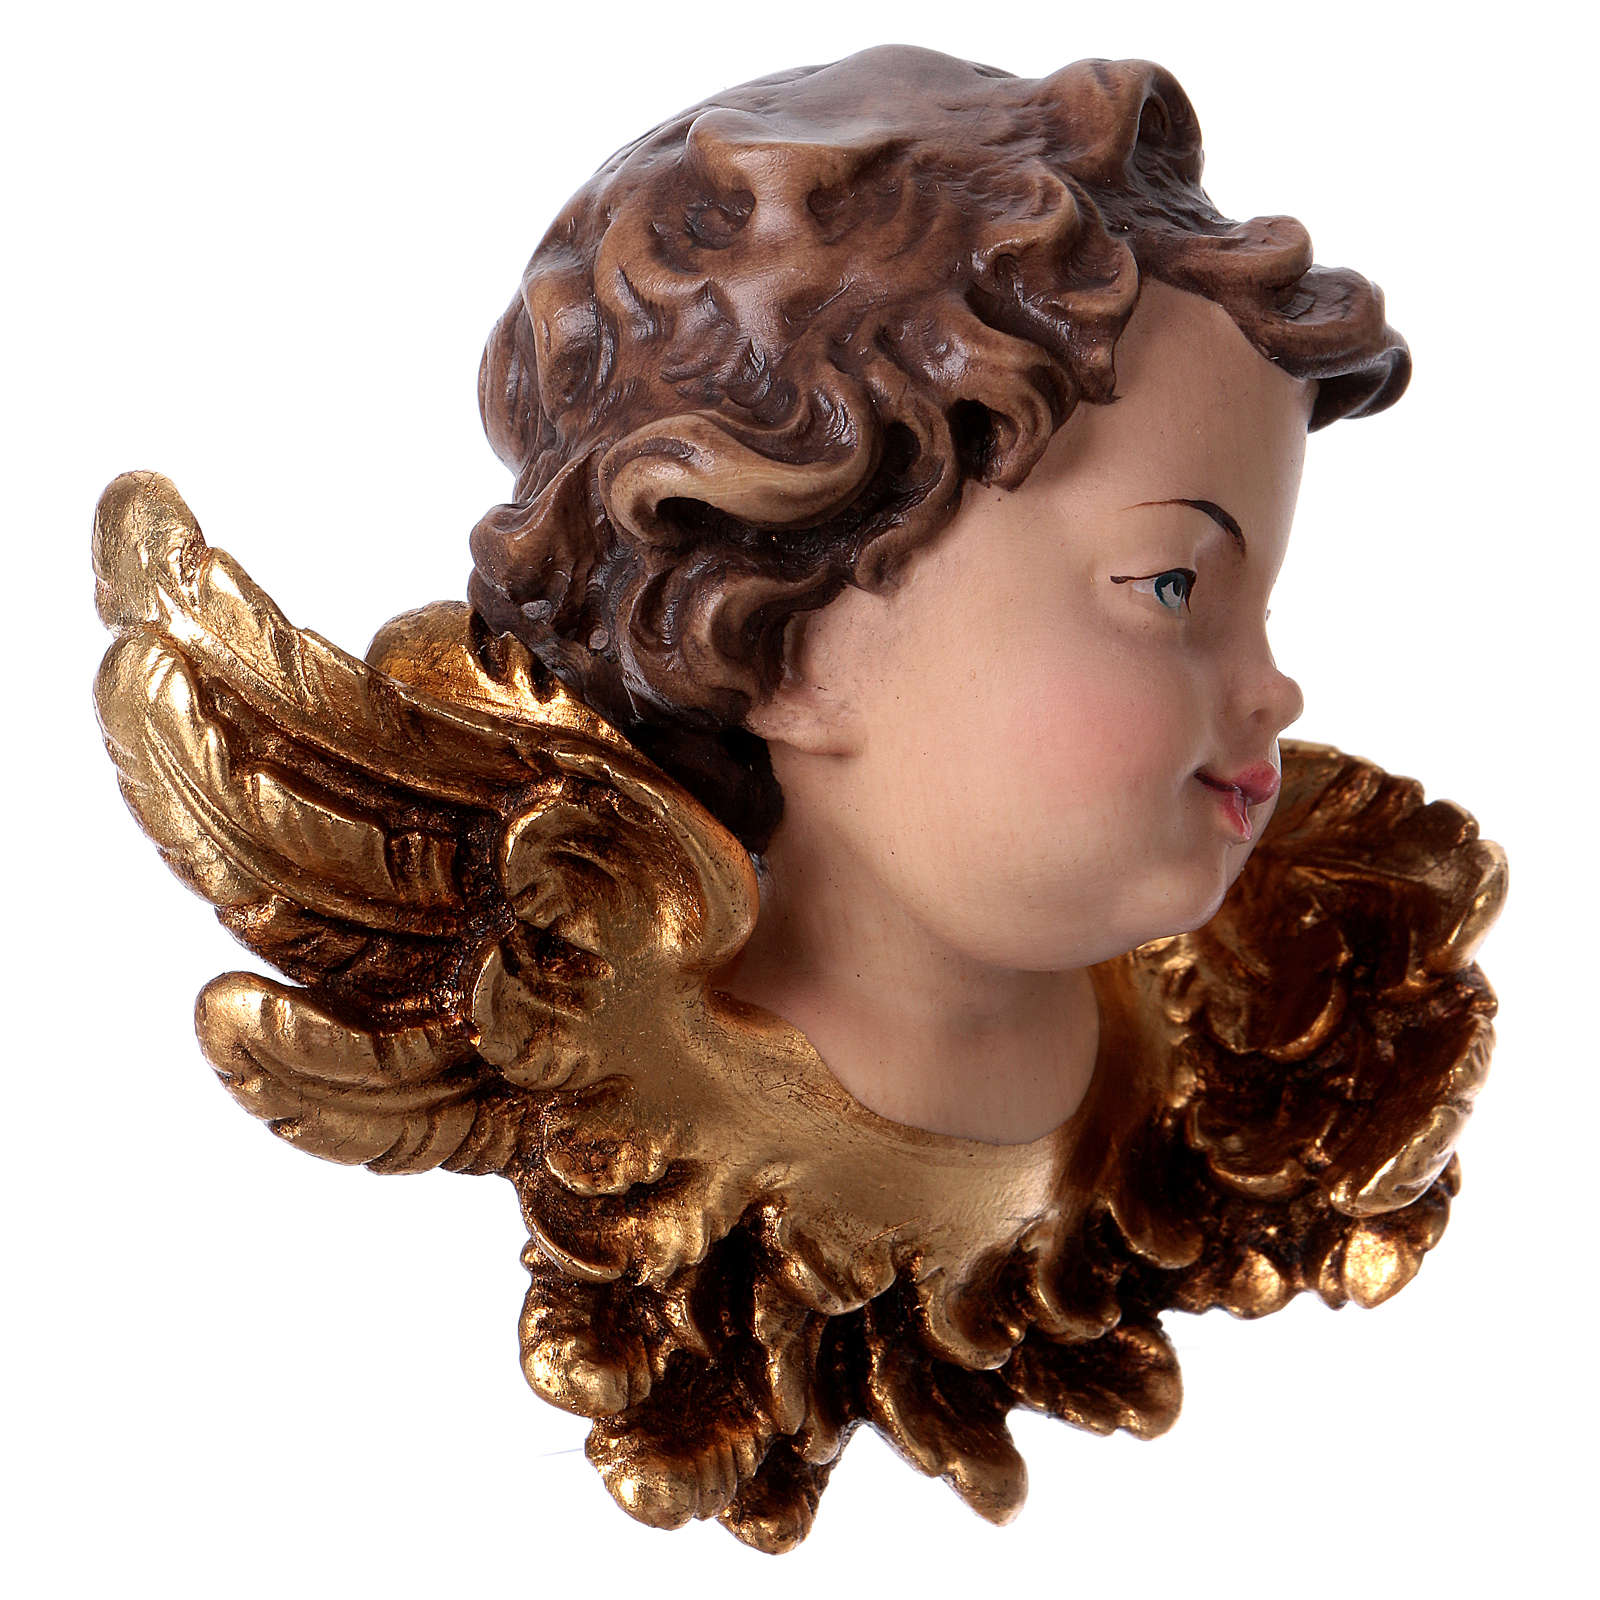 Testina d'angelo sinistra legno Valgardena 3